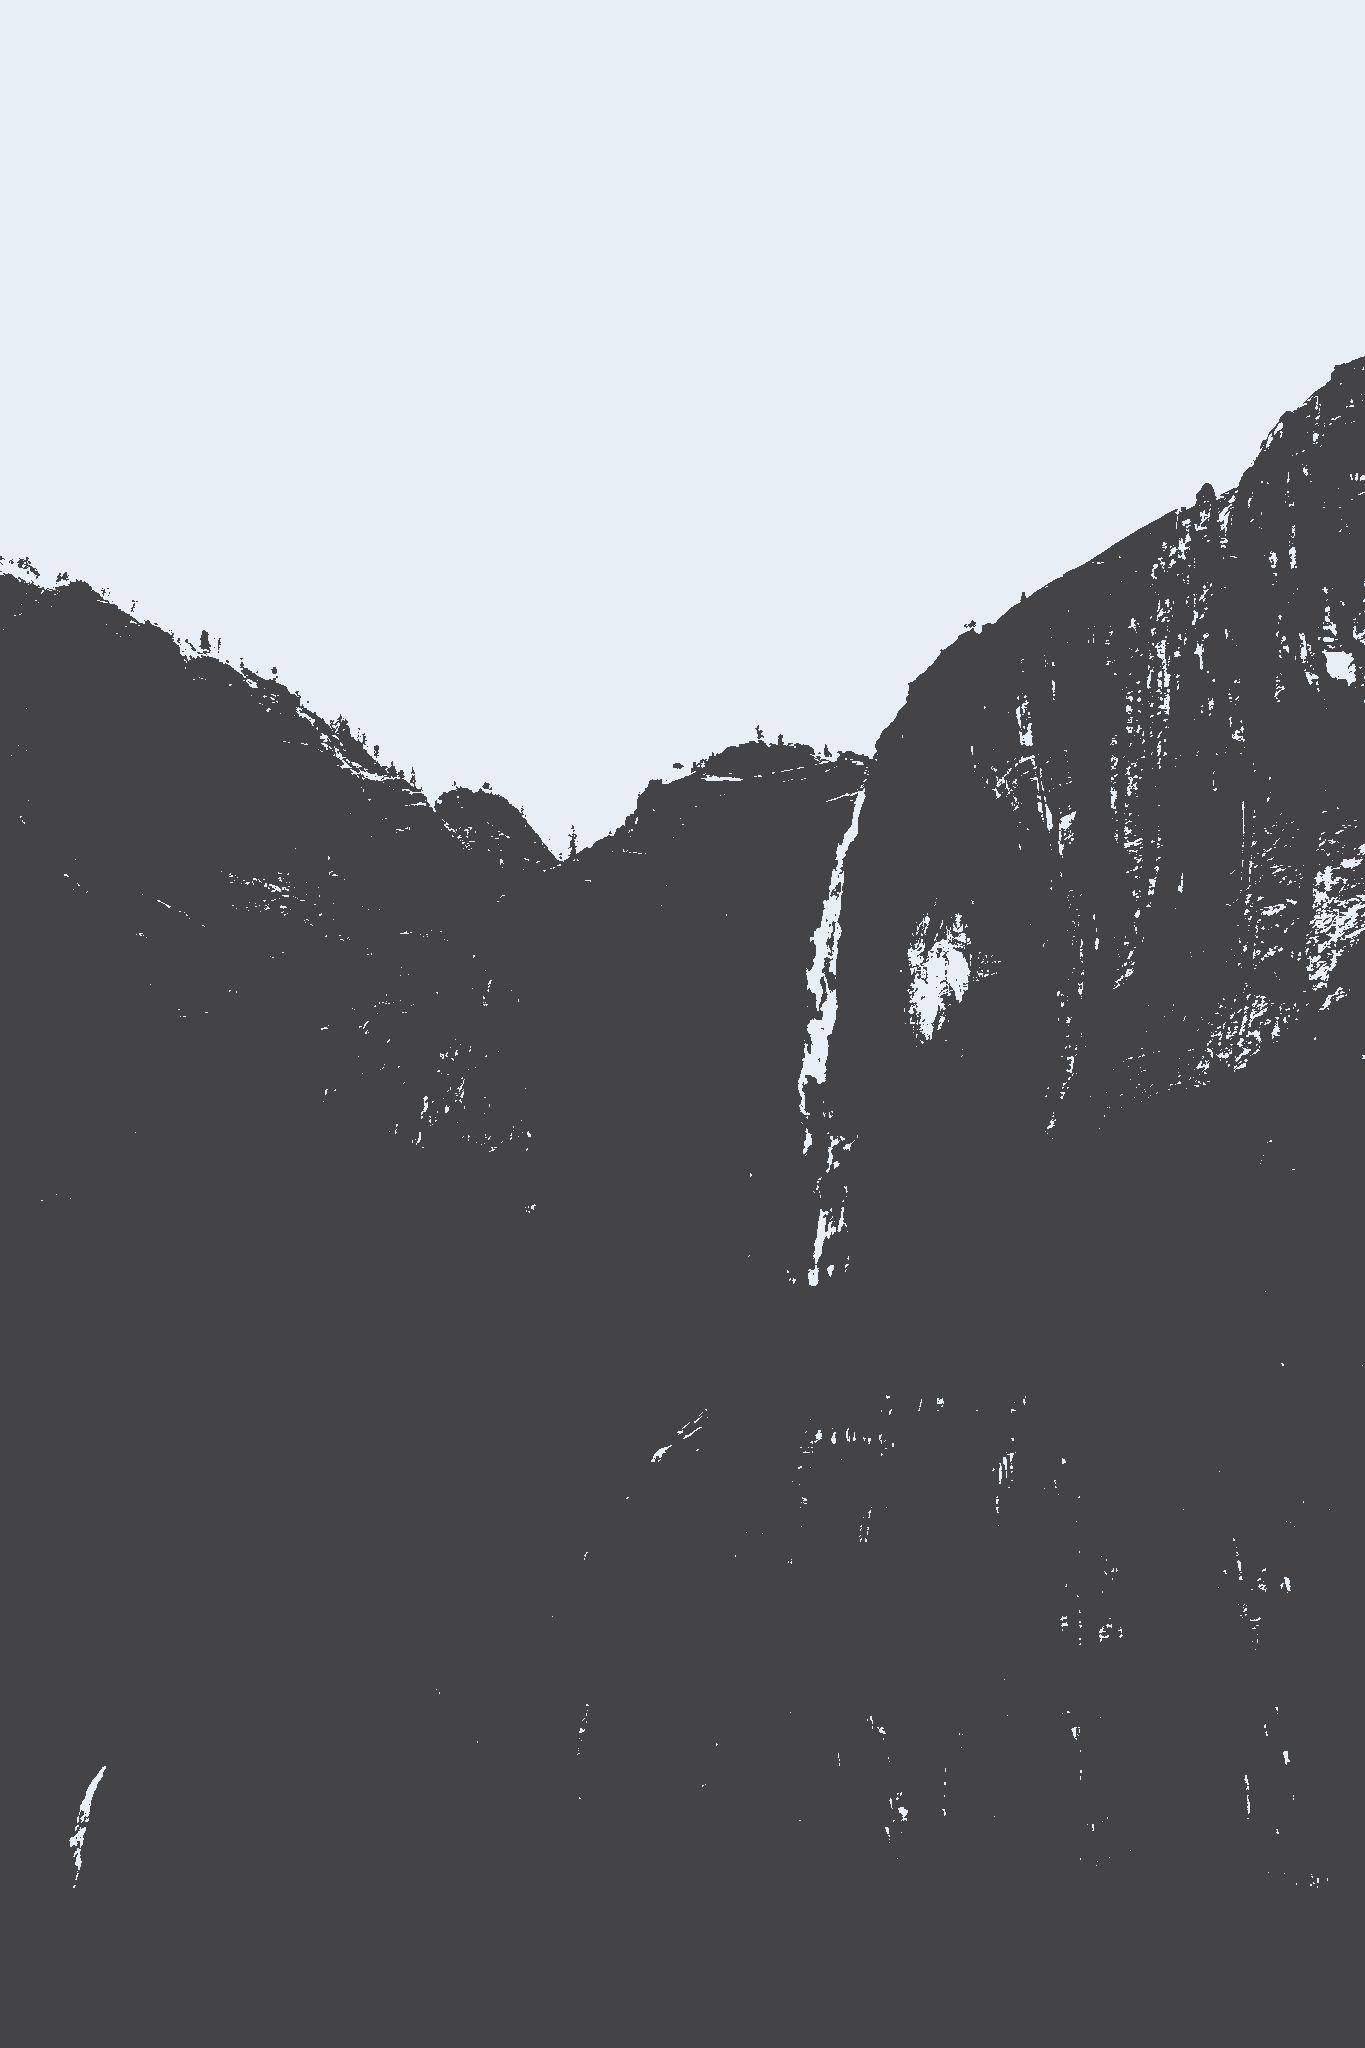 YosemiteBMono.png